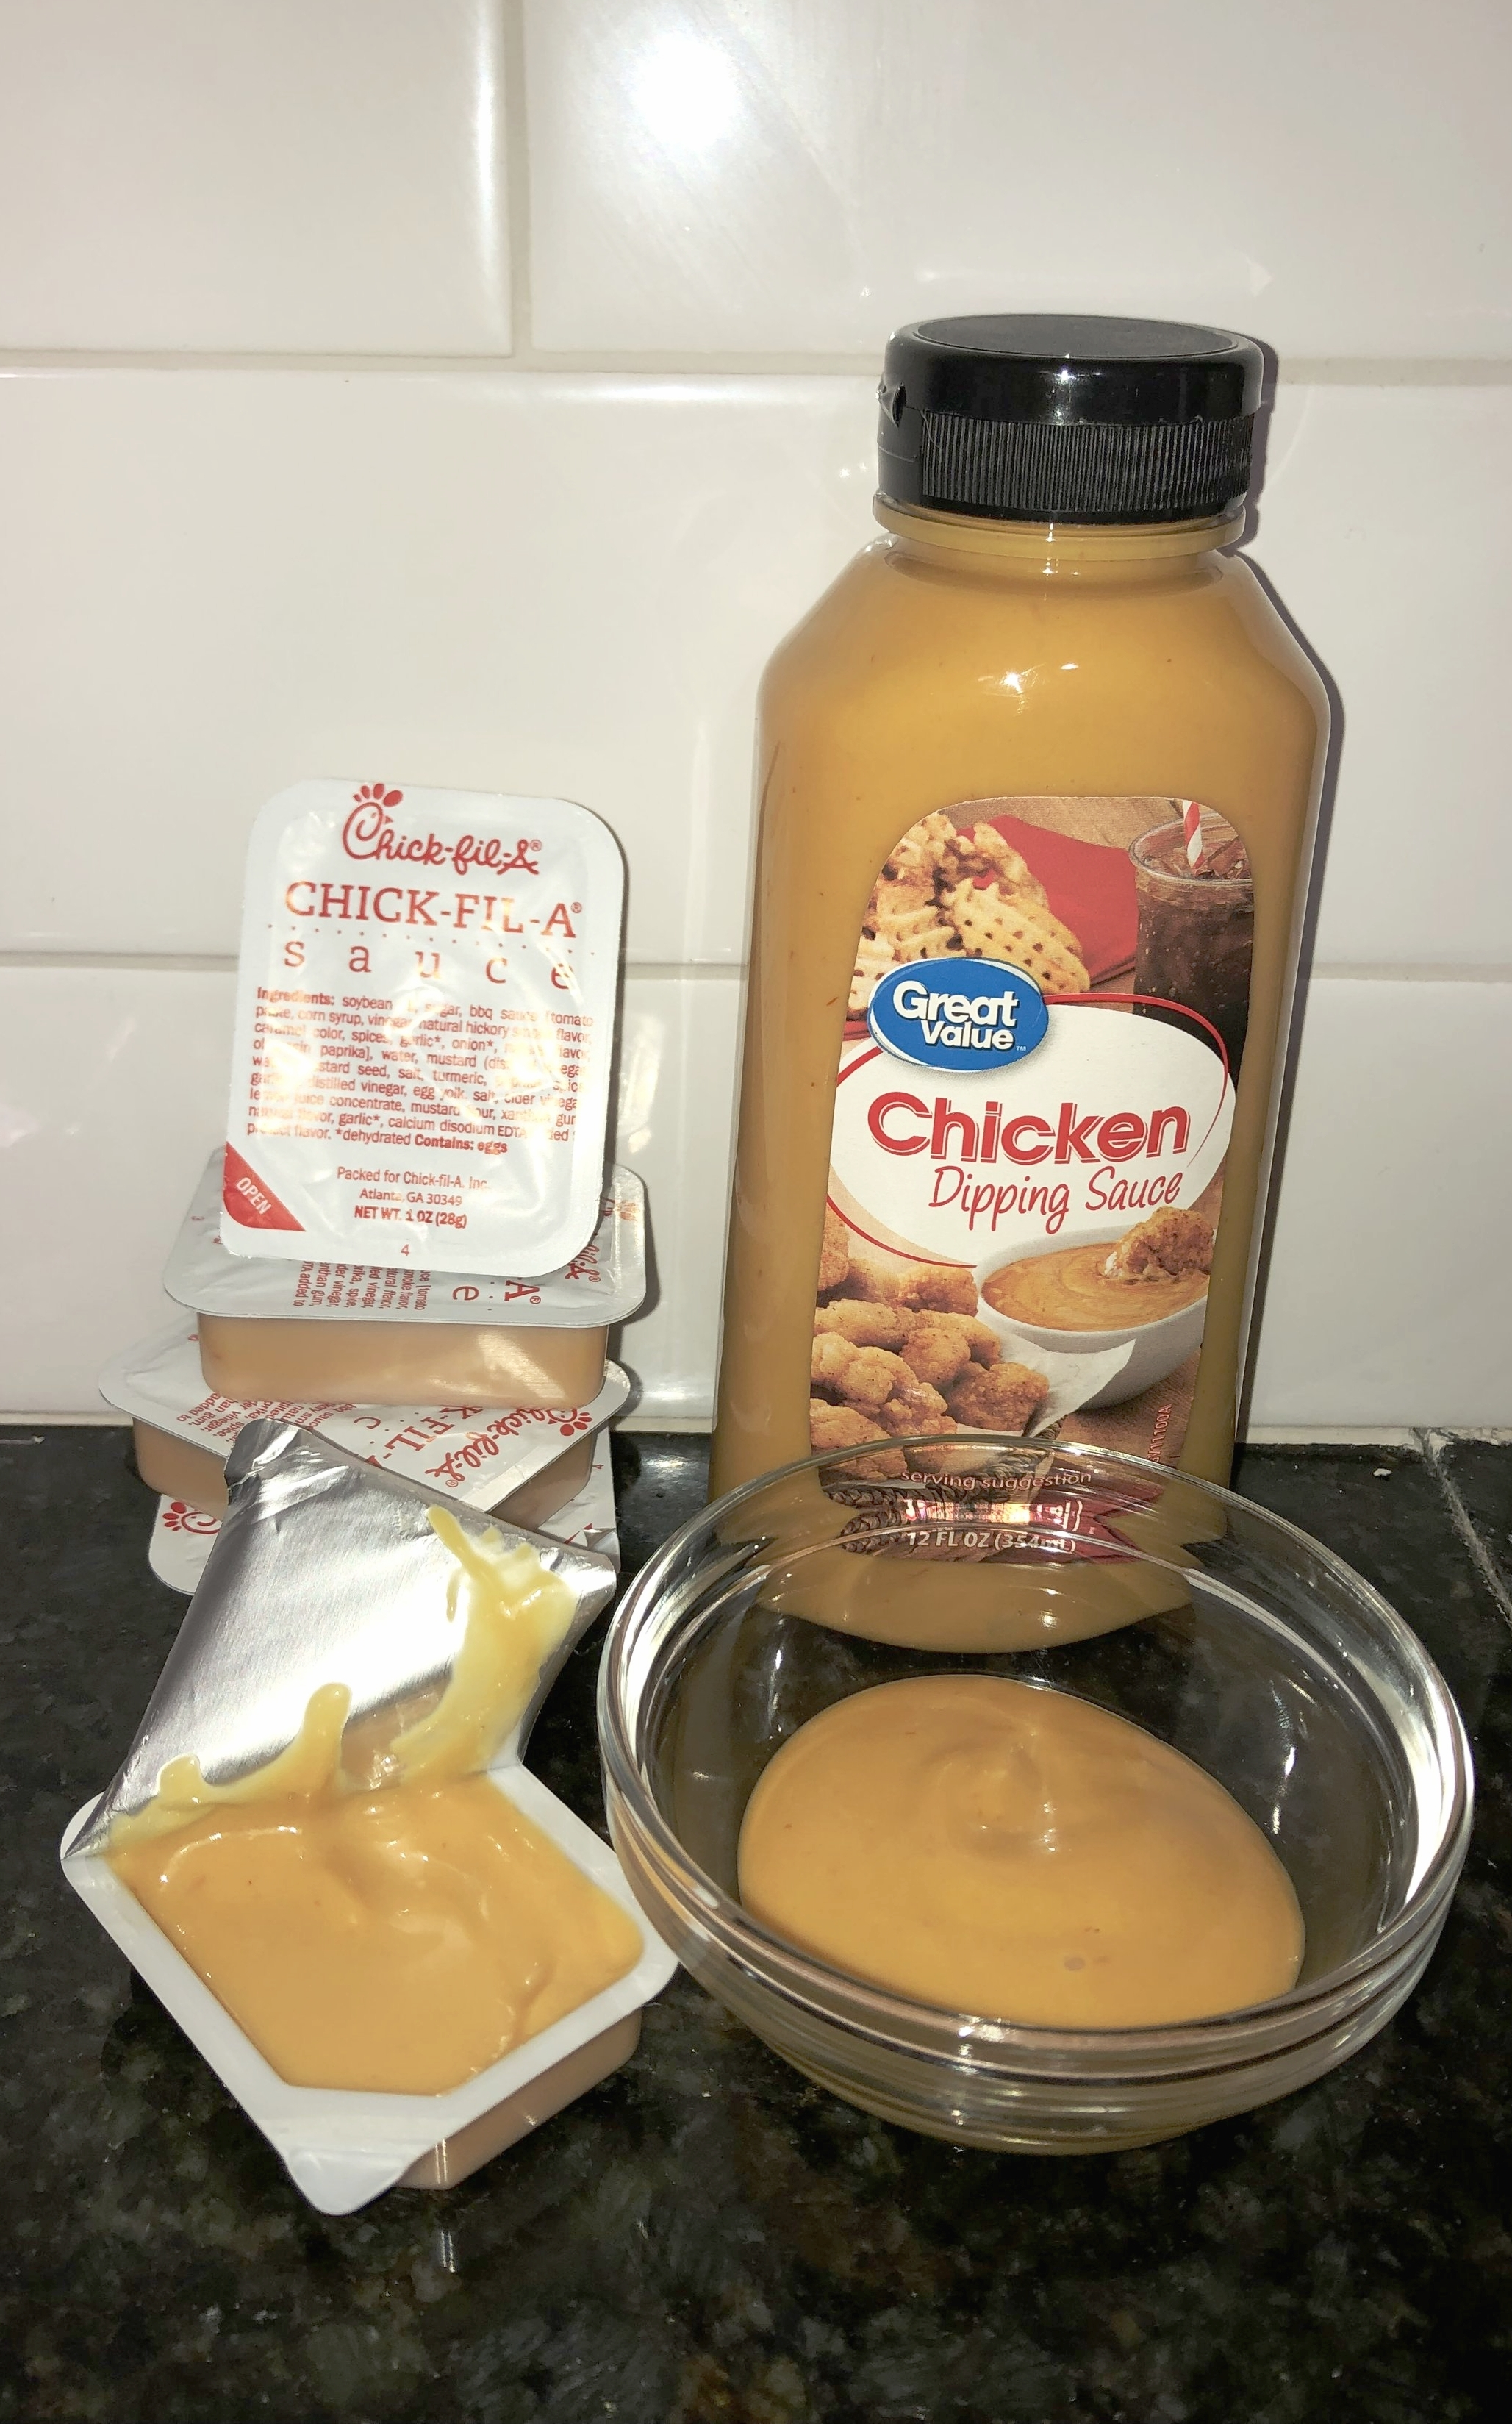 chick fil a sauces